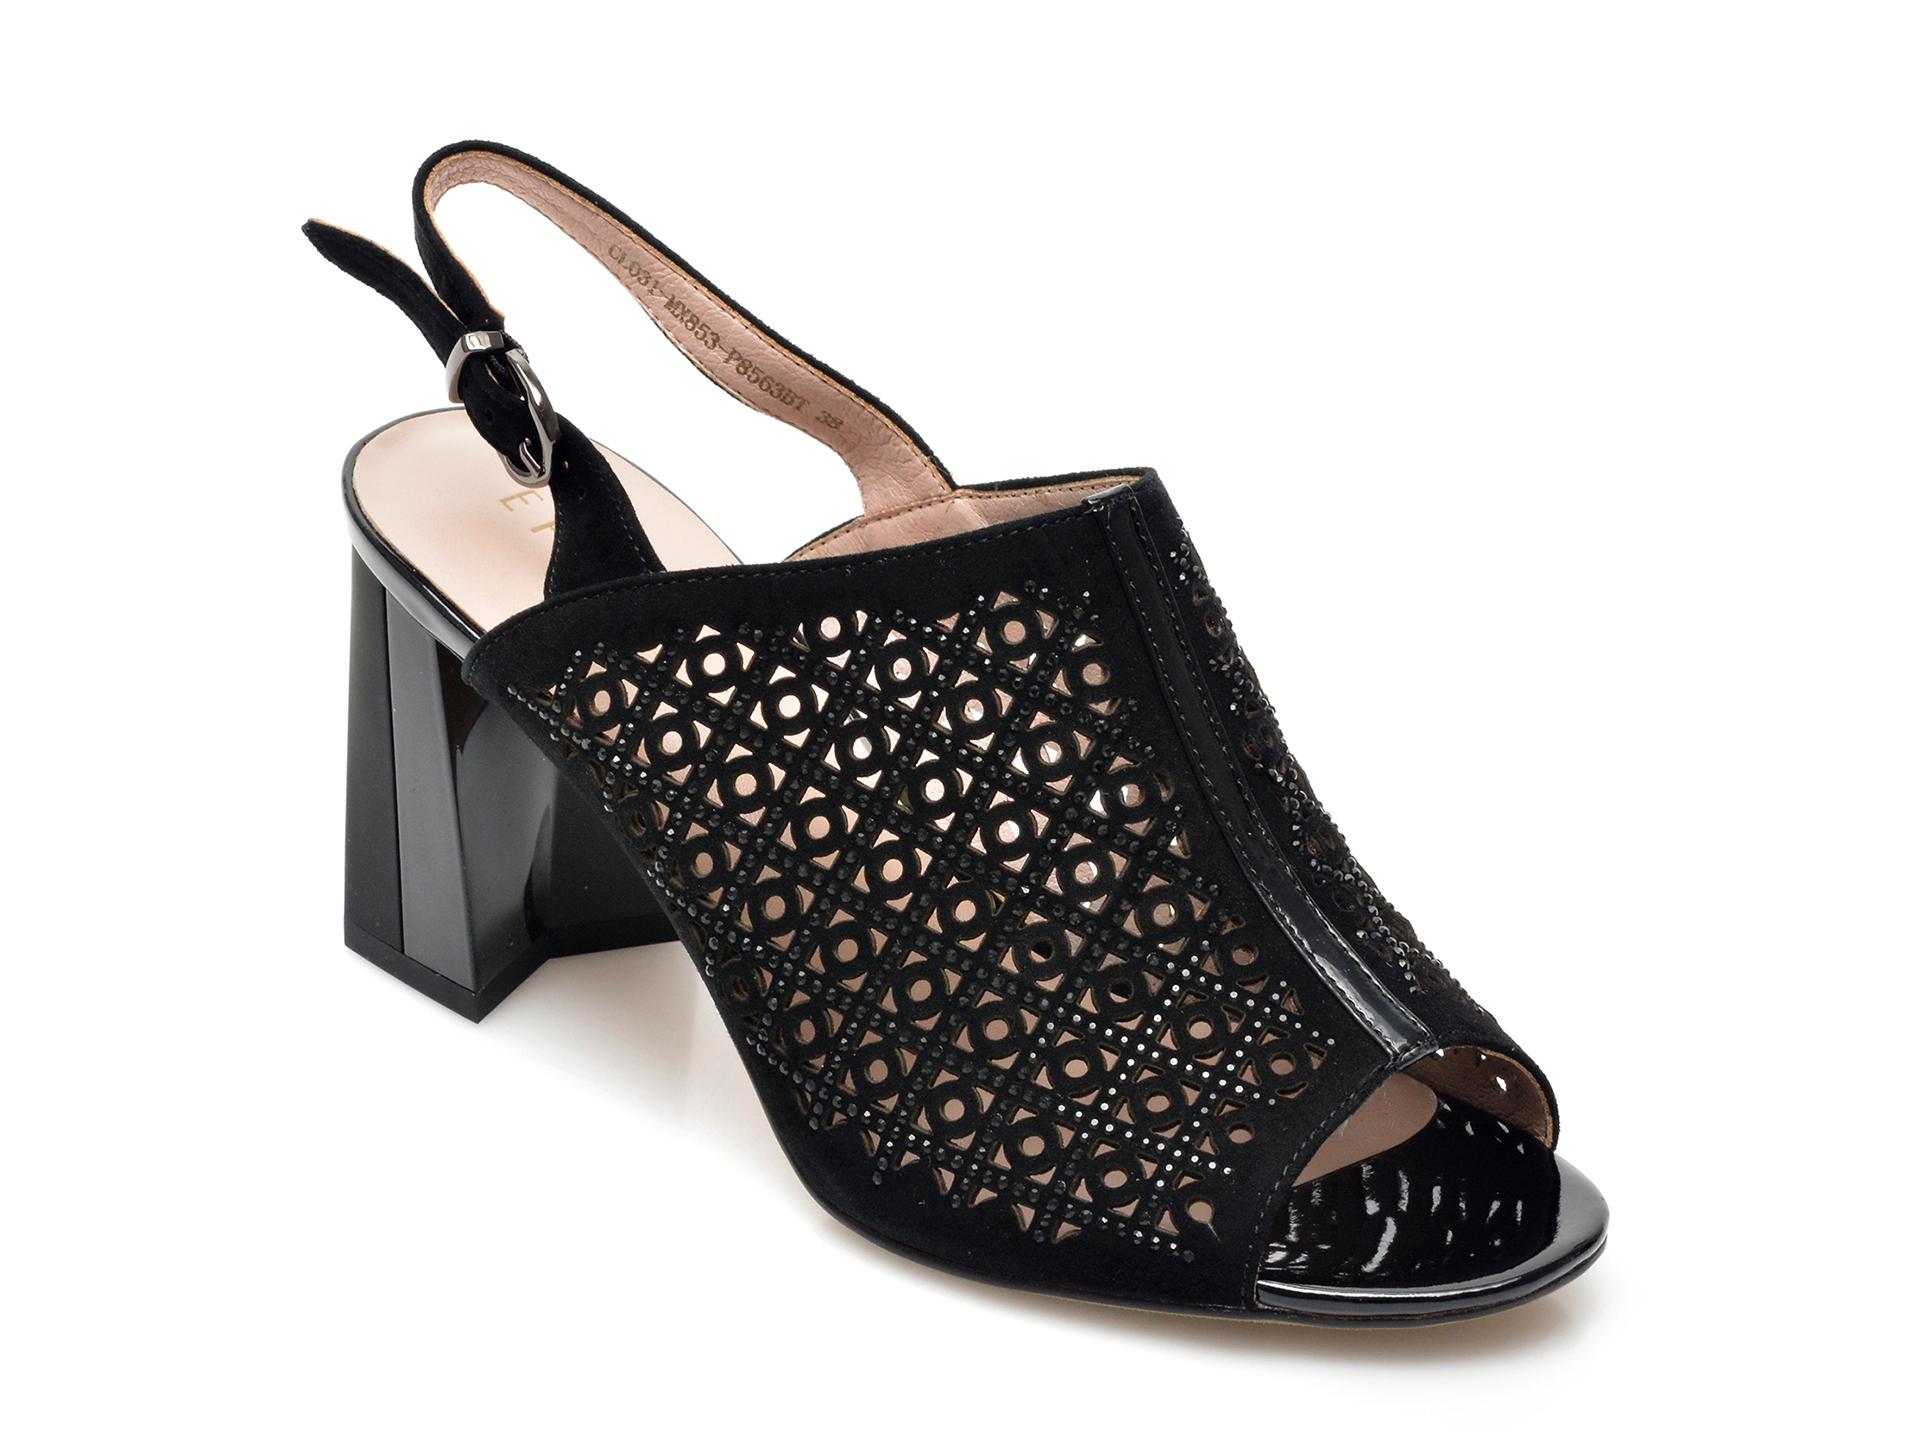 Sandale EPICA negre, MX853, din piele intoarsa